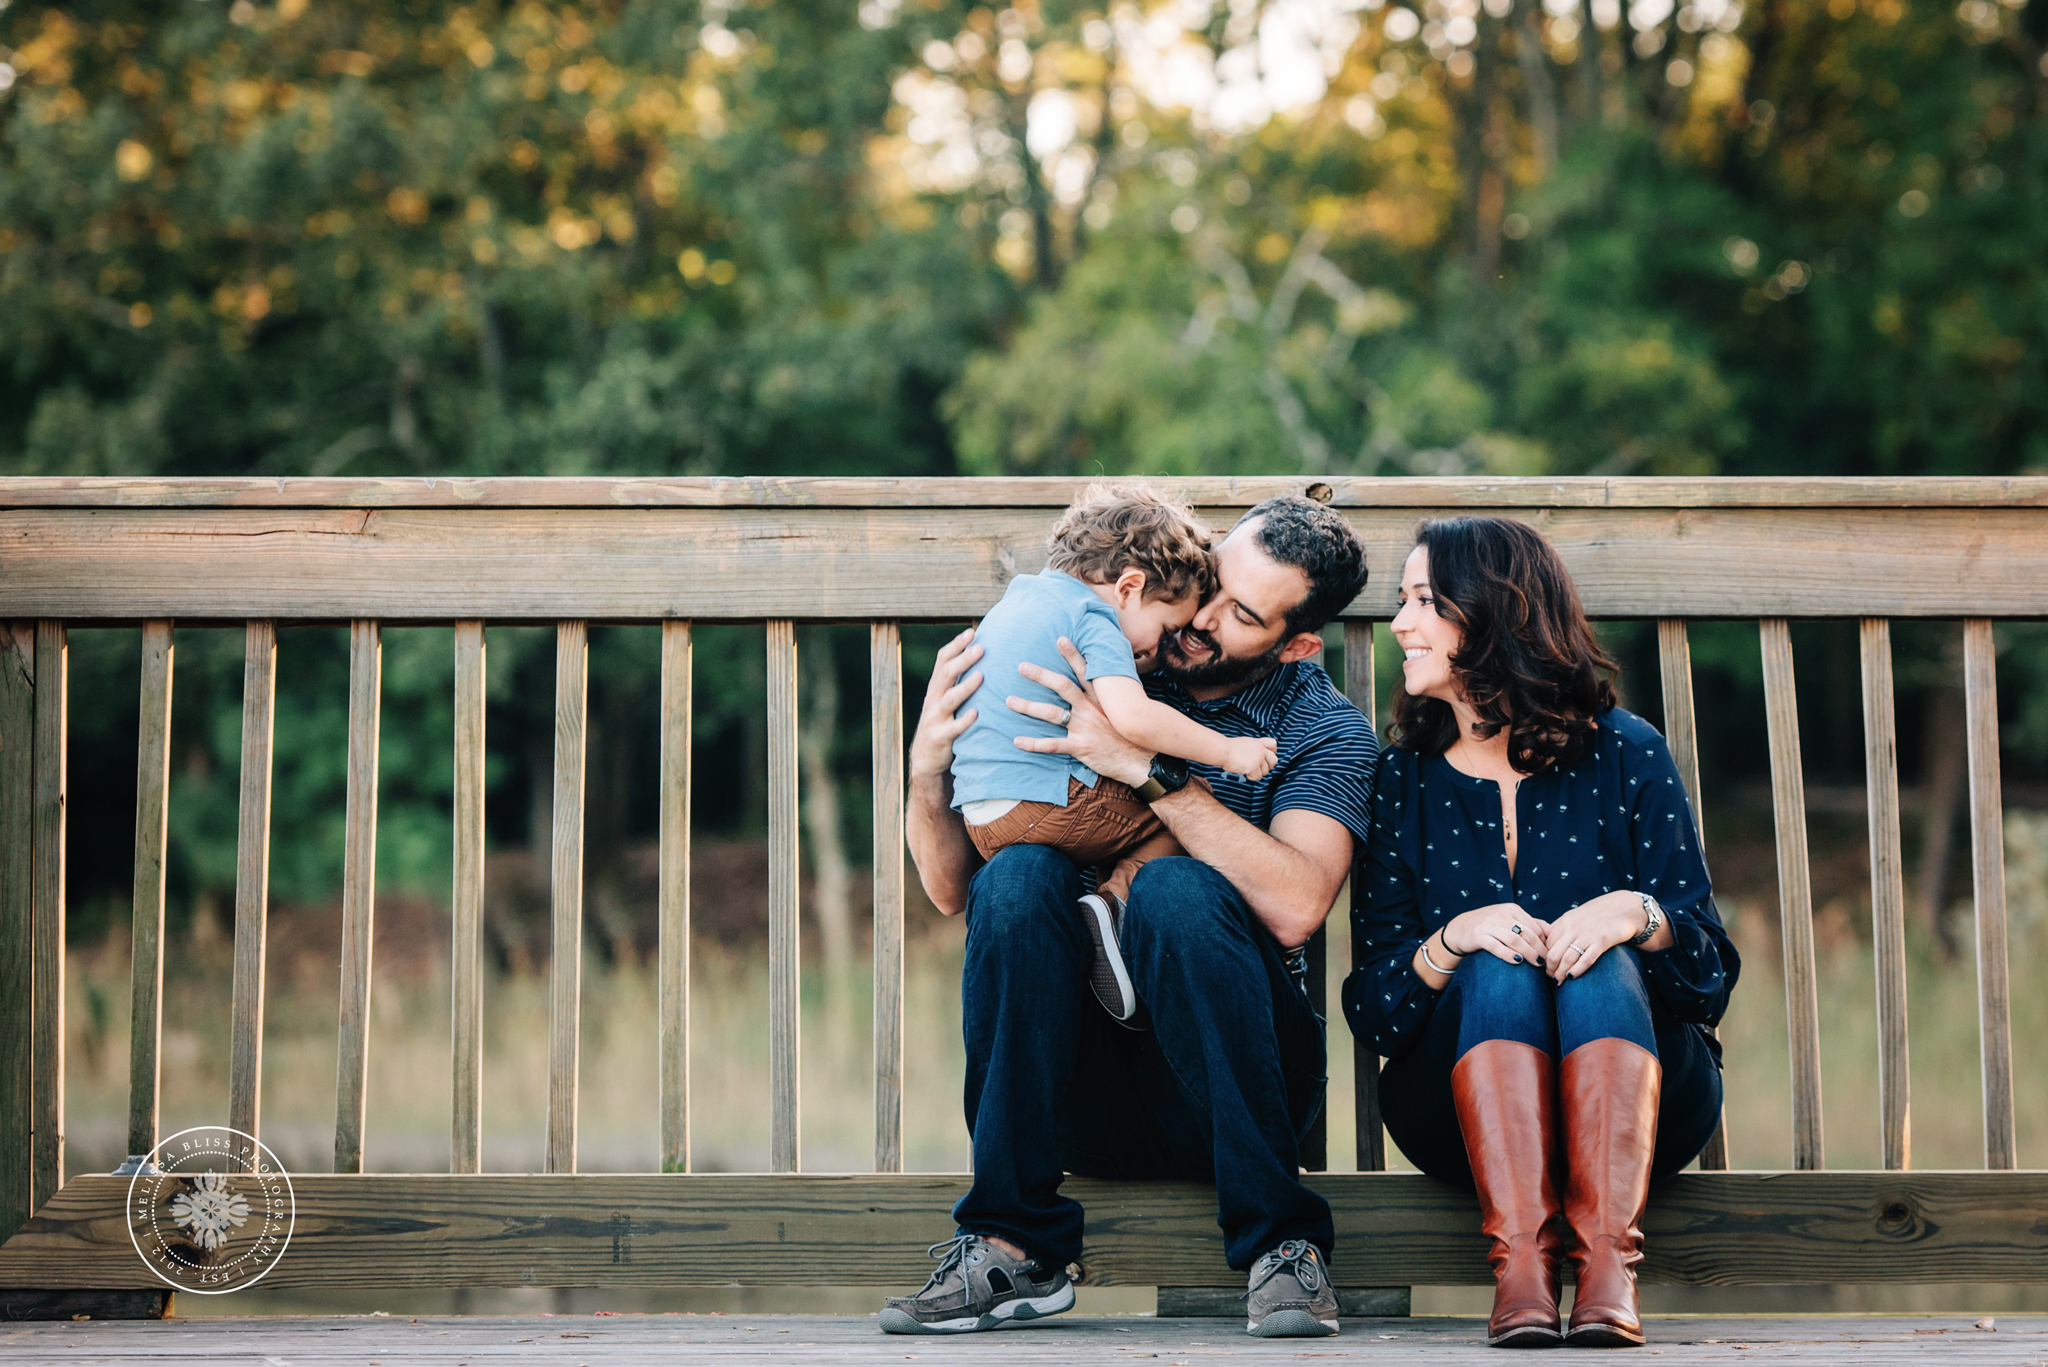 chesapeake-family-photographer-melissa-bliss-photography-fall-family-photo-session-norfolk-virginia-beach-smithfield-williamsburg-va